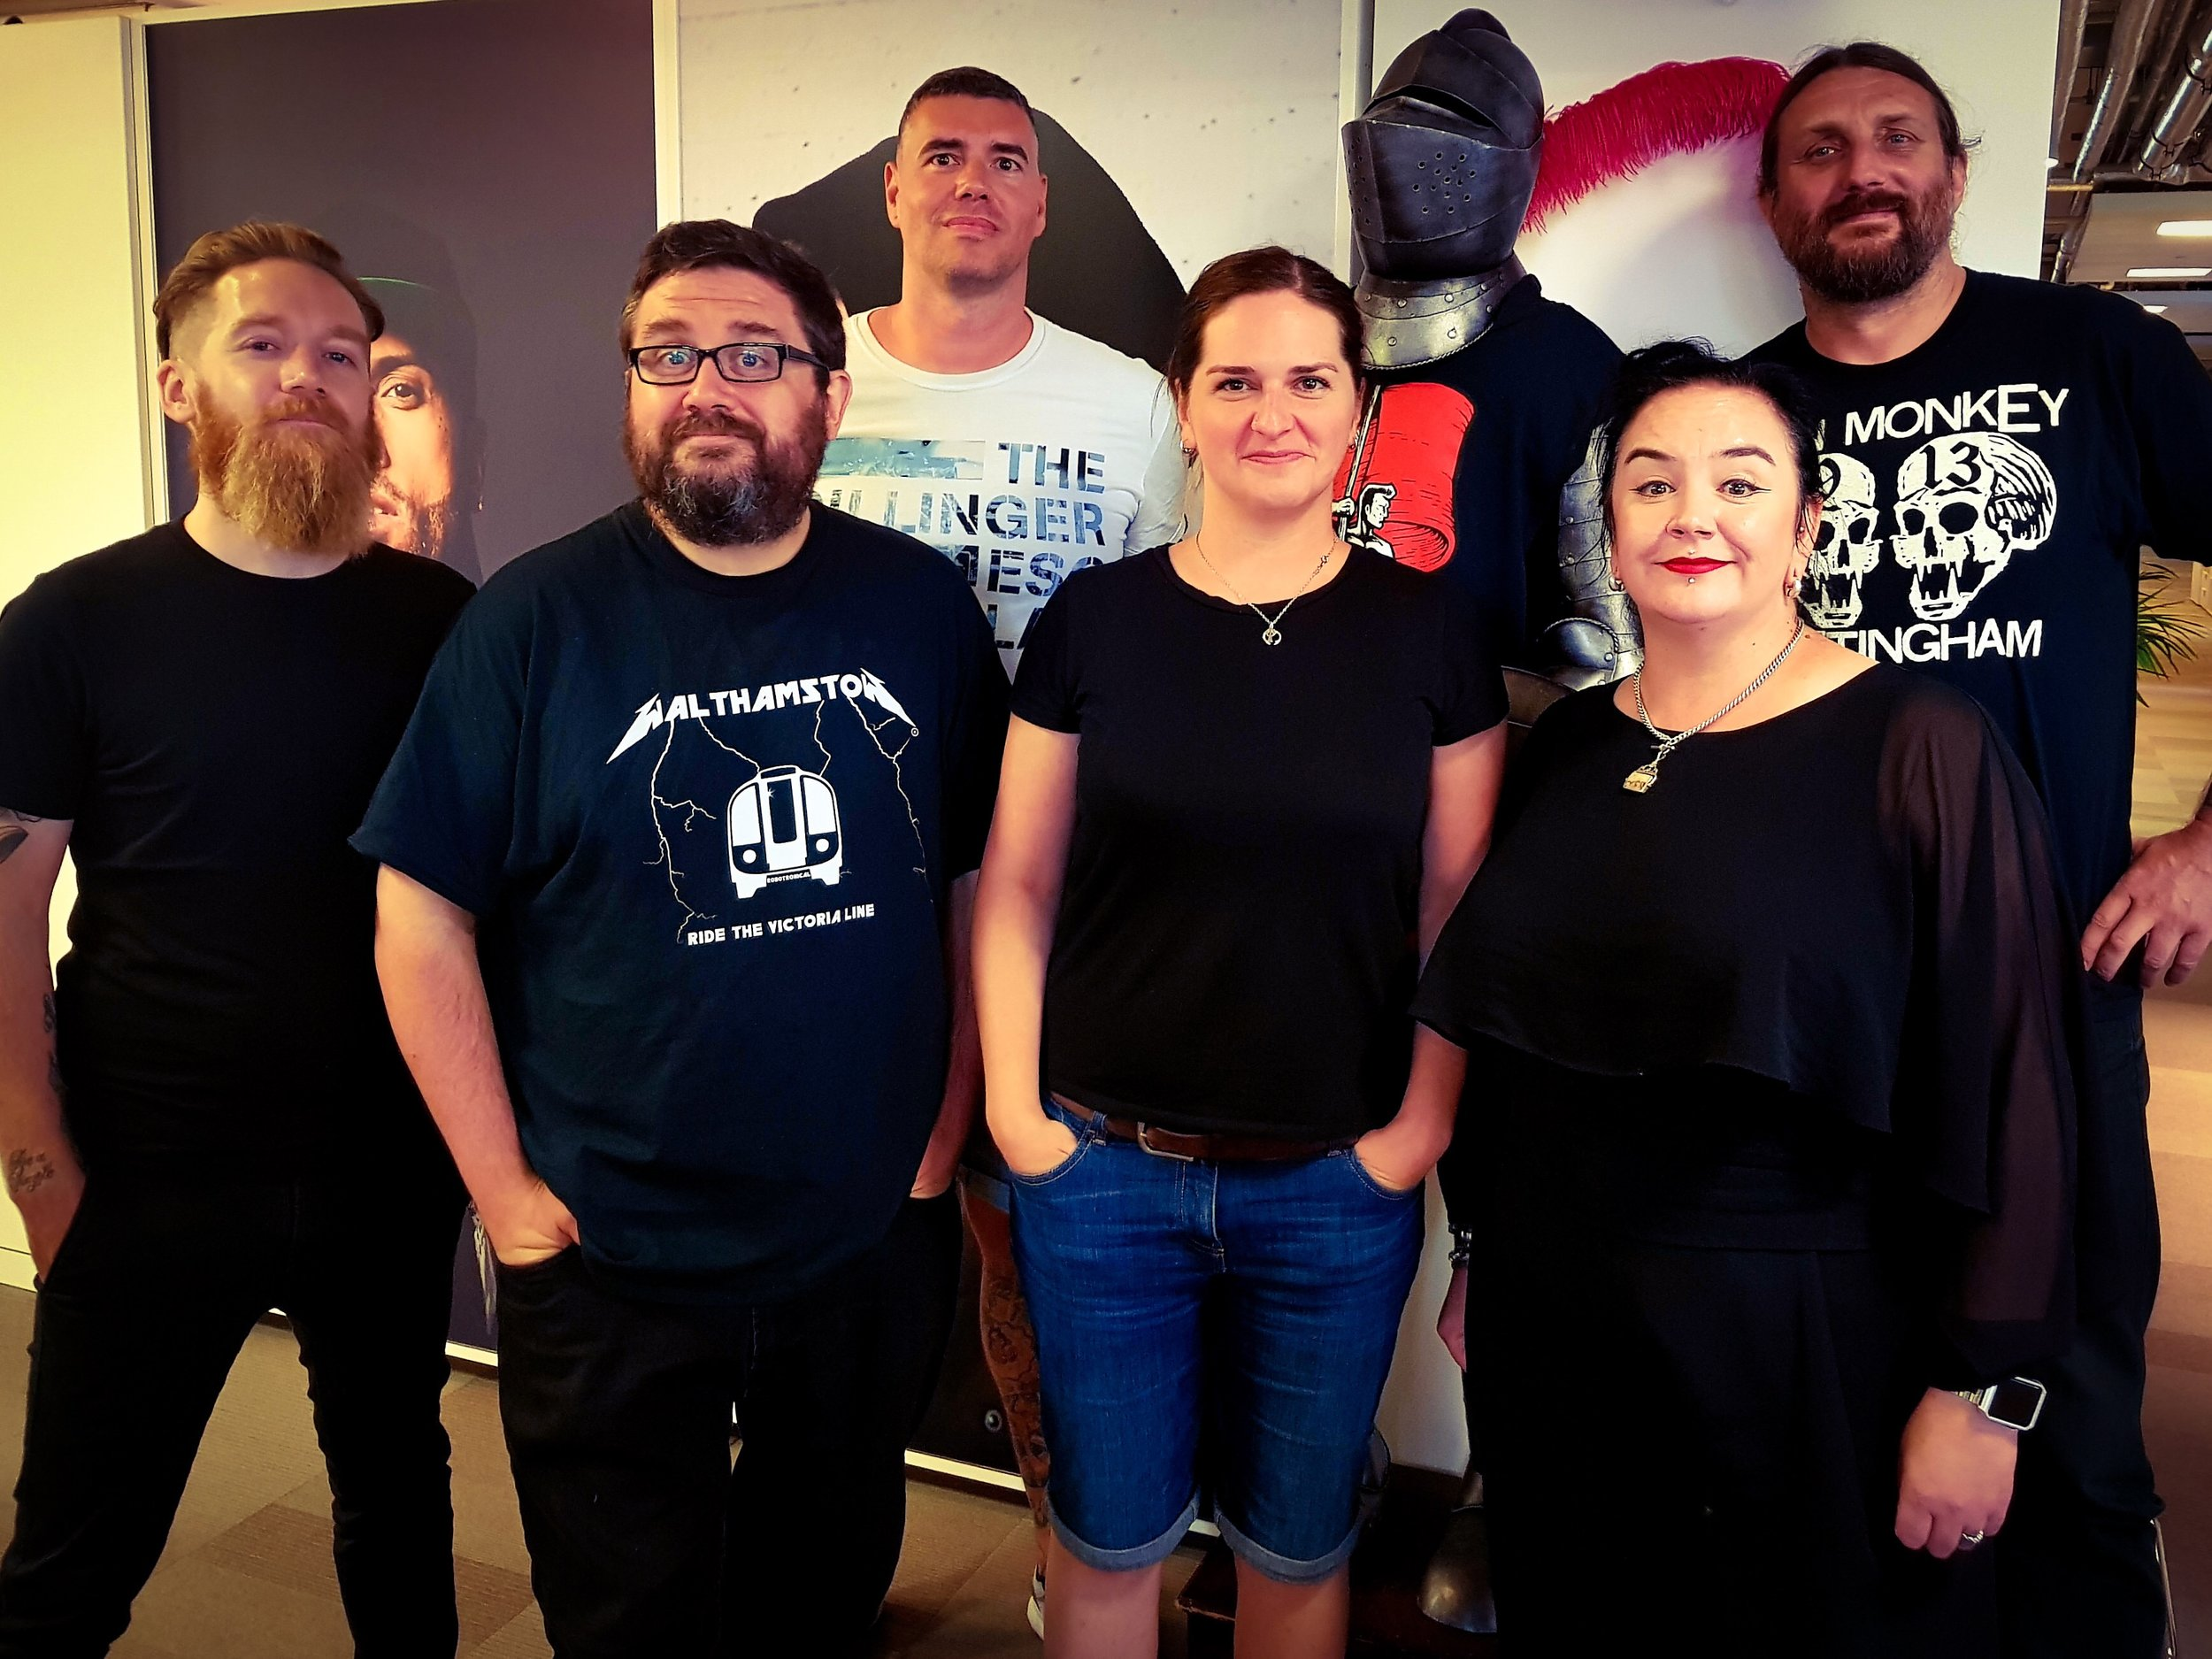 Left to Right: Merlin Sutter (AISA U.K.), Joel De`ath (Music For Nations/Sony), Simon Füllemann (CEO AISAmusic), Kate Piatkowska (AISA U.K.), Julie Weir (Music For Nations/Sony), Ben Ward (United Talent Agency)